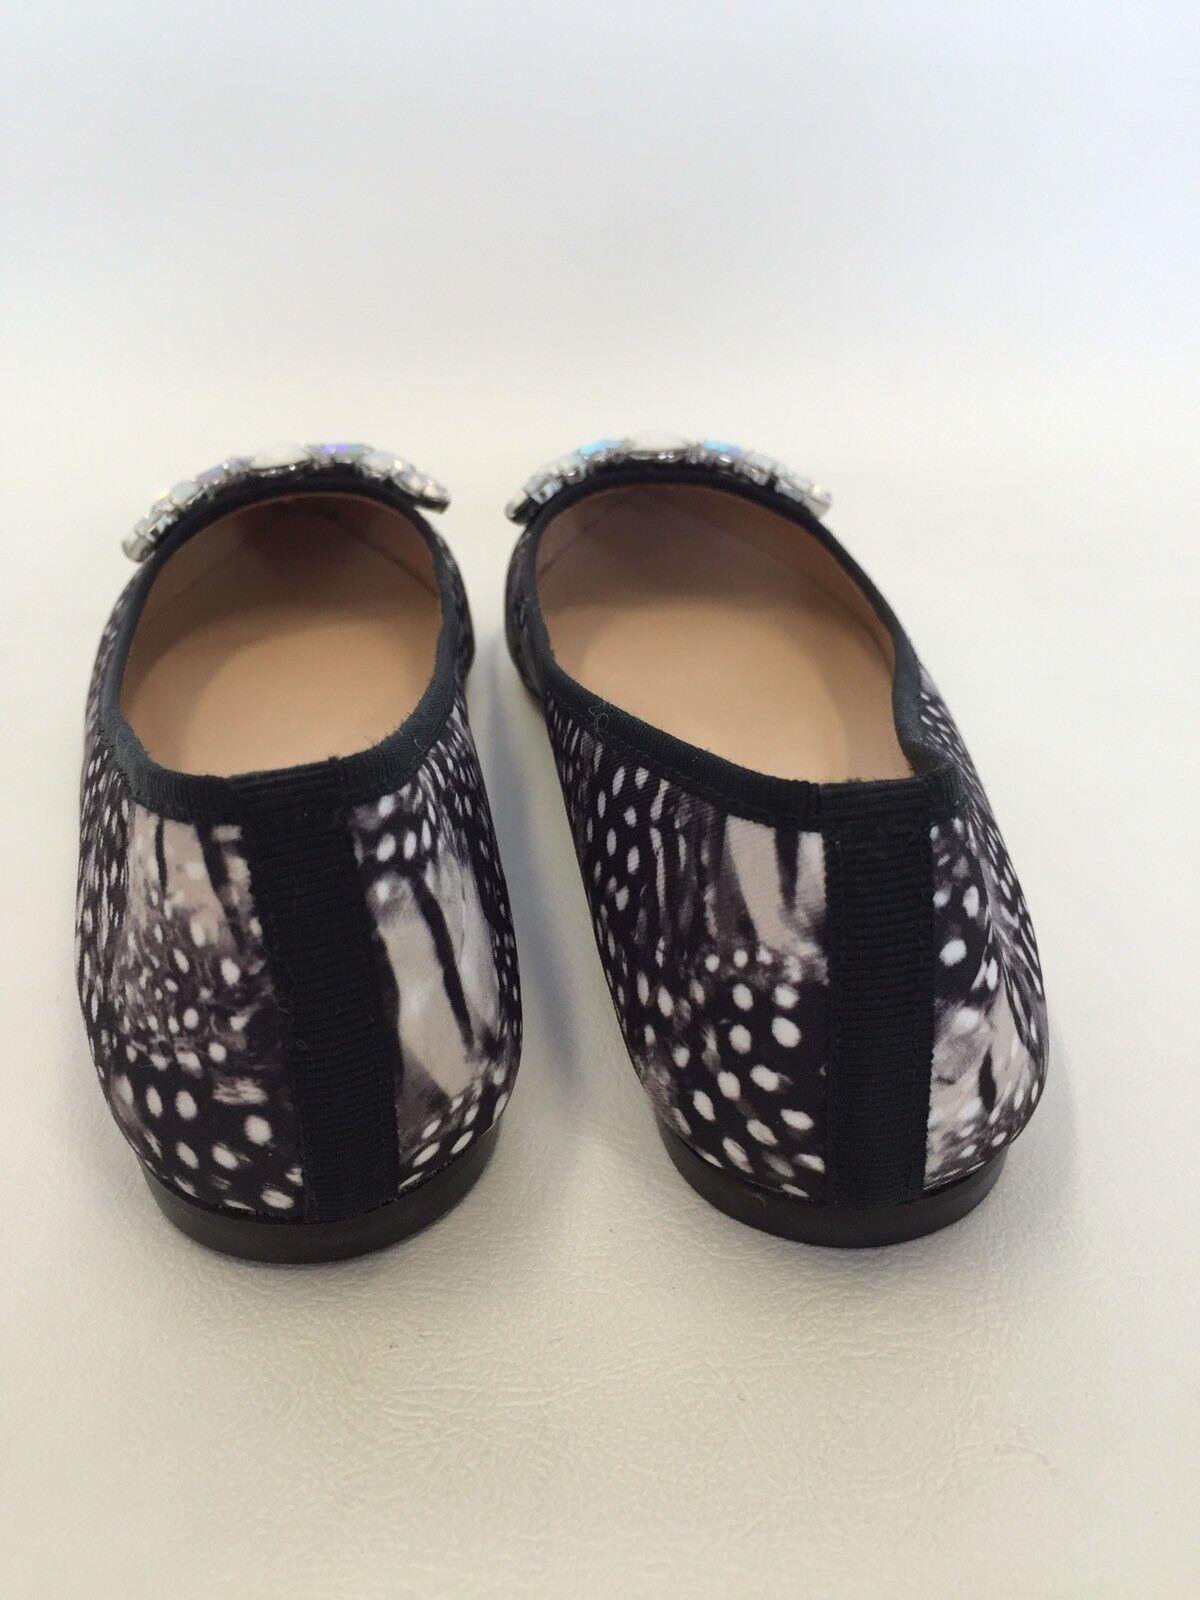 NEW JCrew Collection Gemma Jeweled feather print flats black black black Sz 5 E4659  238 61b7ce